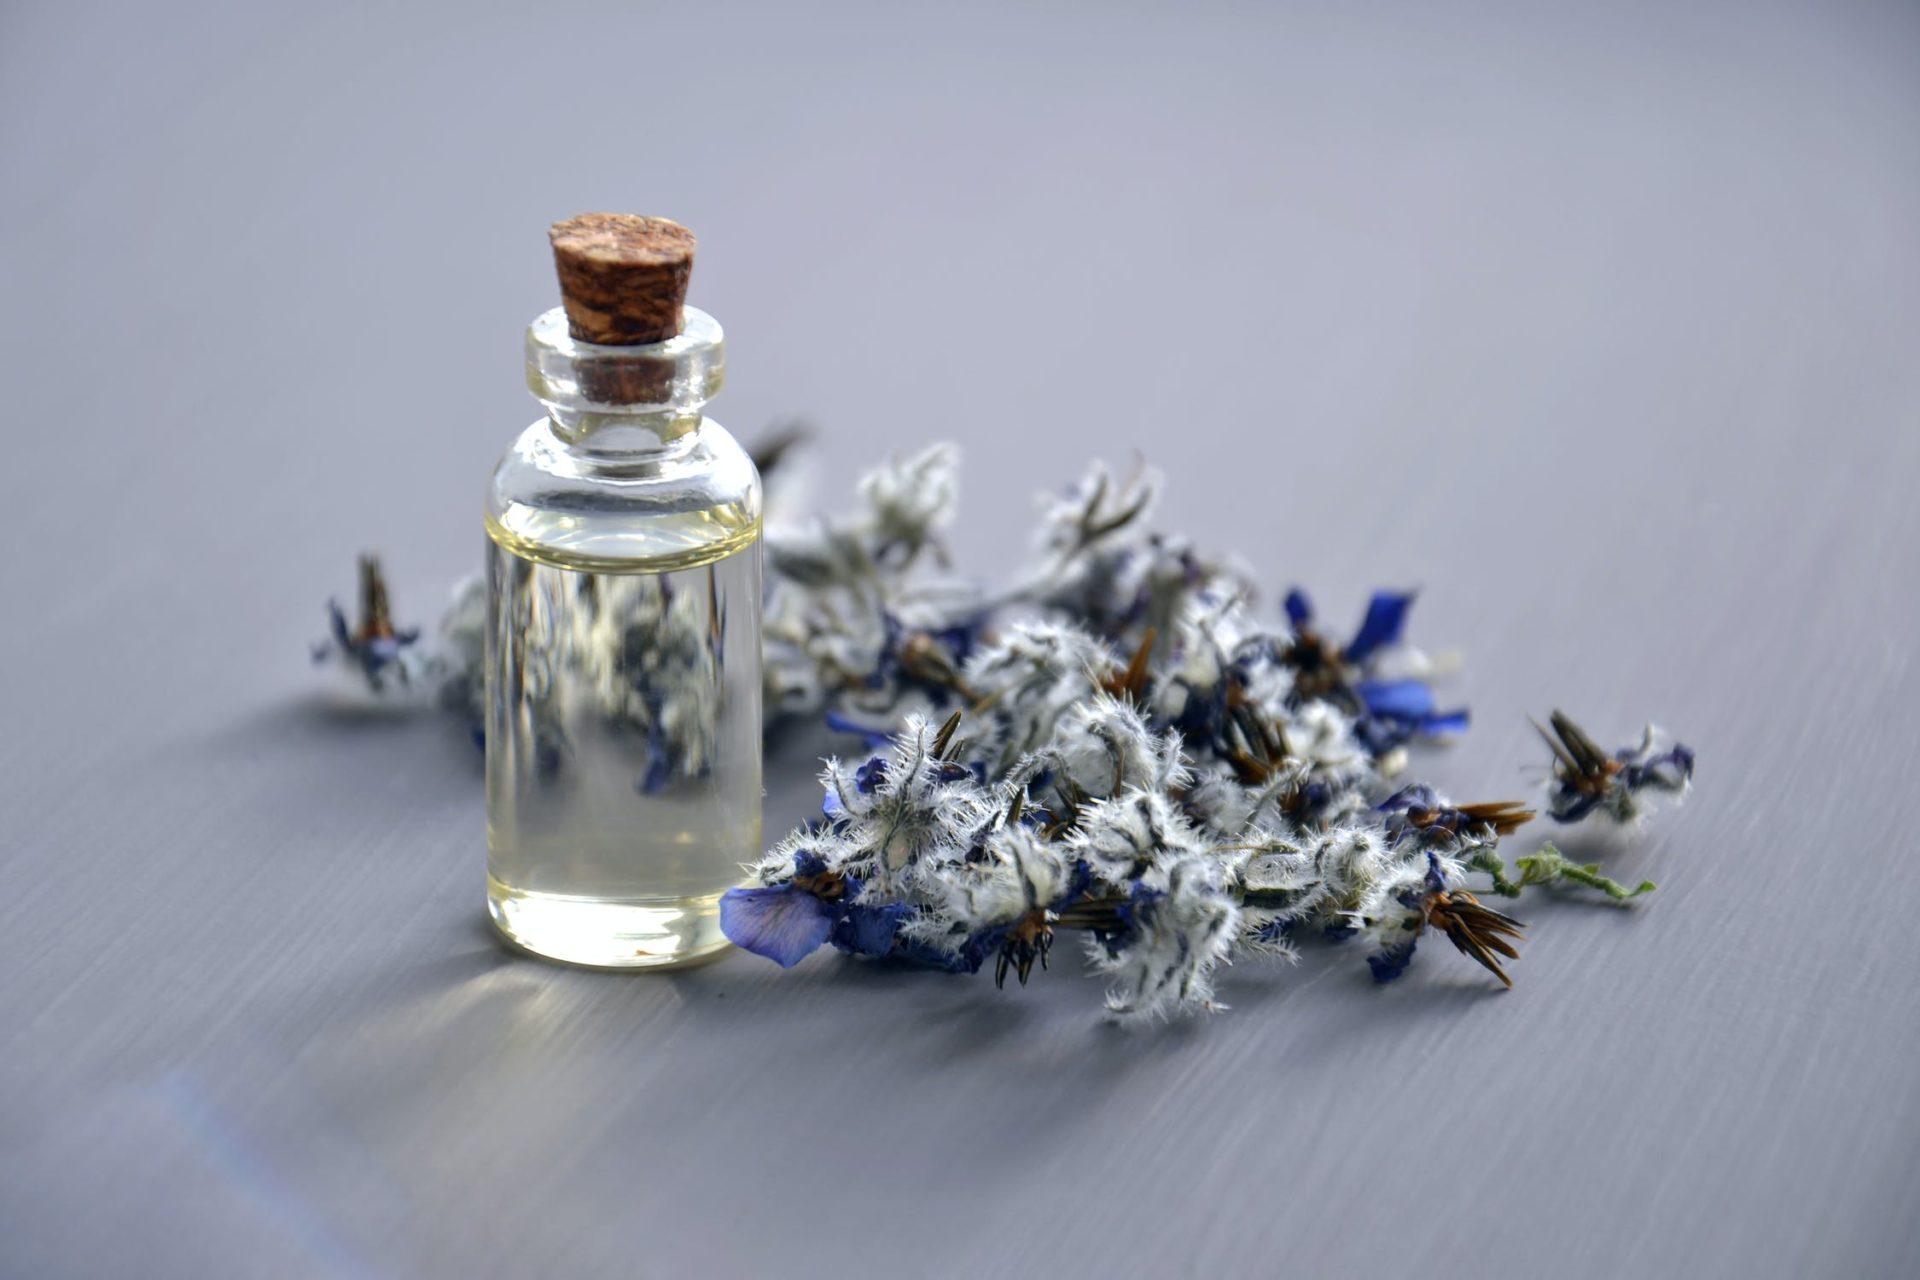 heat protectant oils